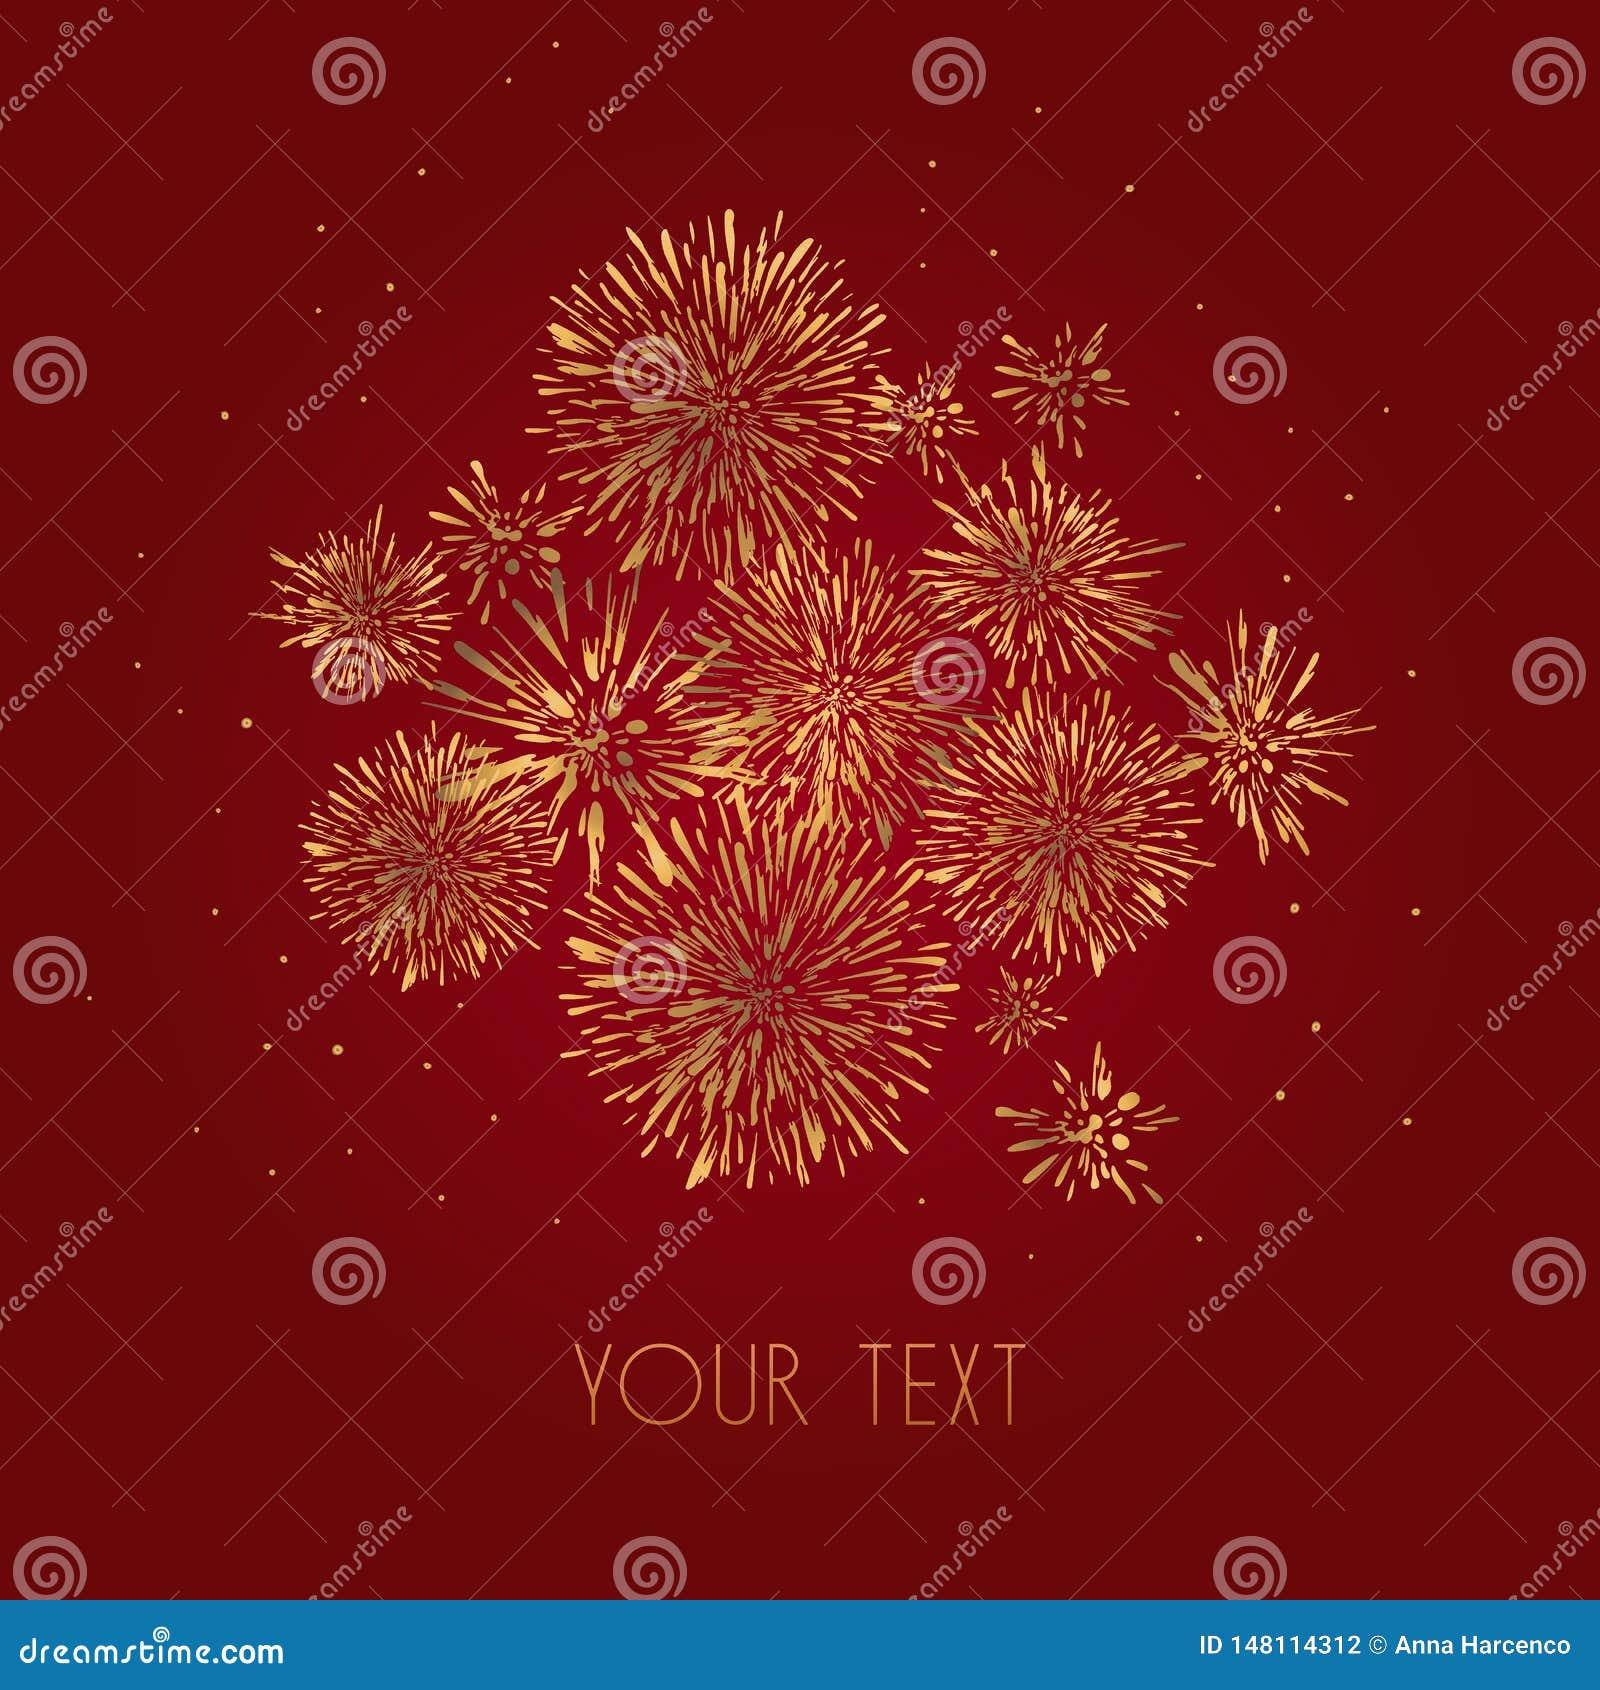 Template design of invitation with gold fireworks. Festive design postcards, invitations, brochures, cover, border. element for de